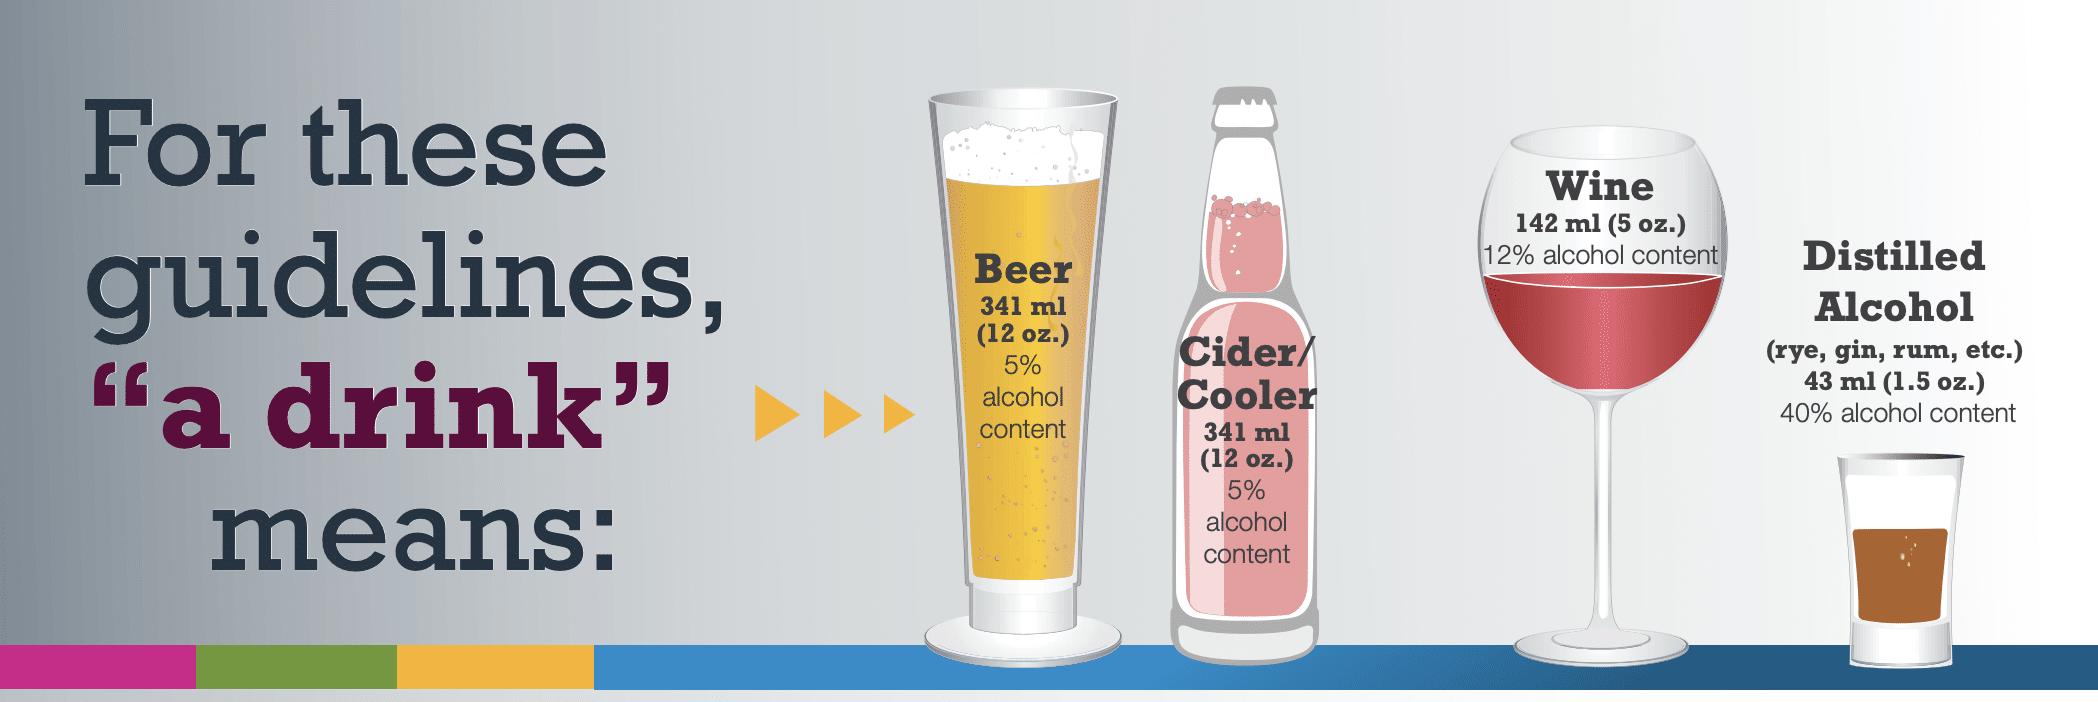 Alcohol - CK Public Health